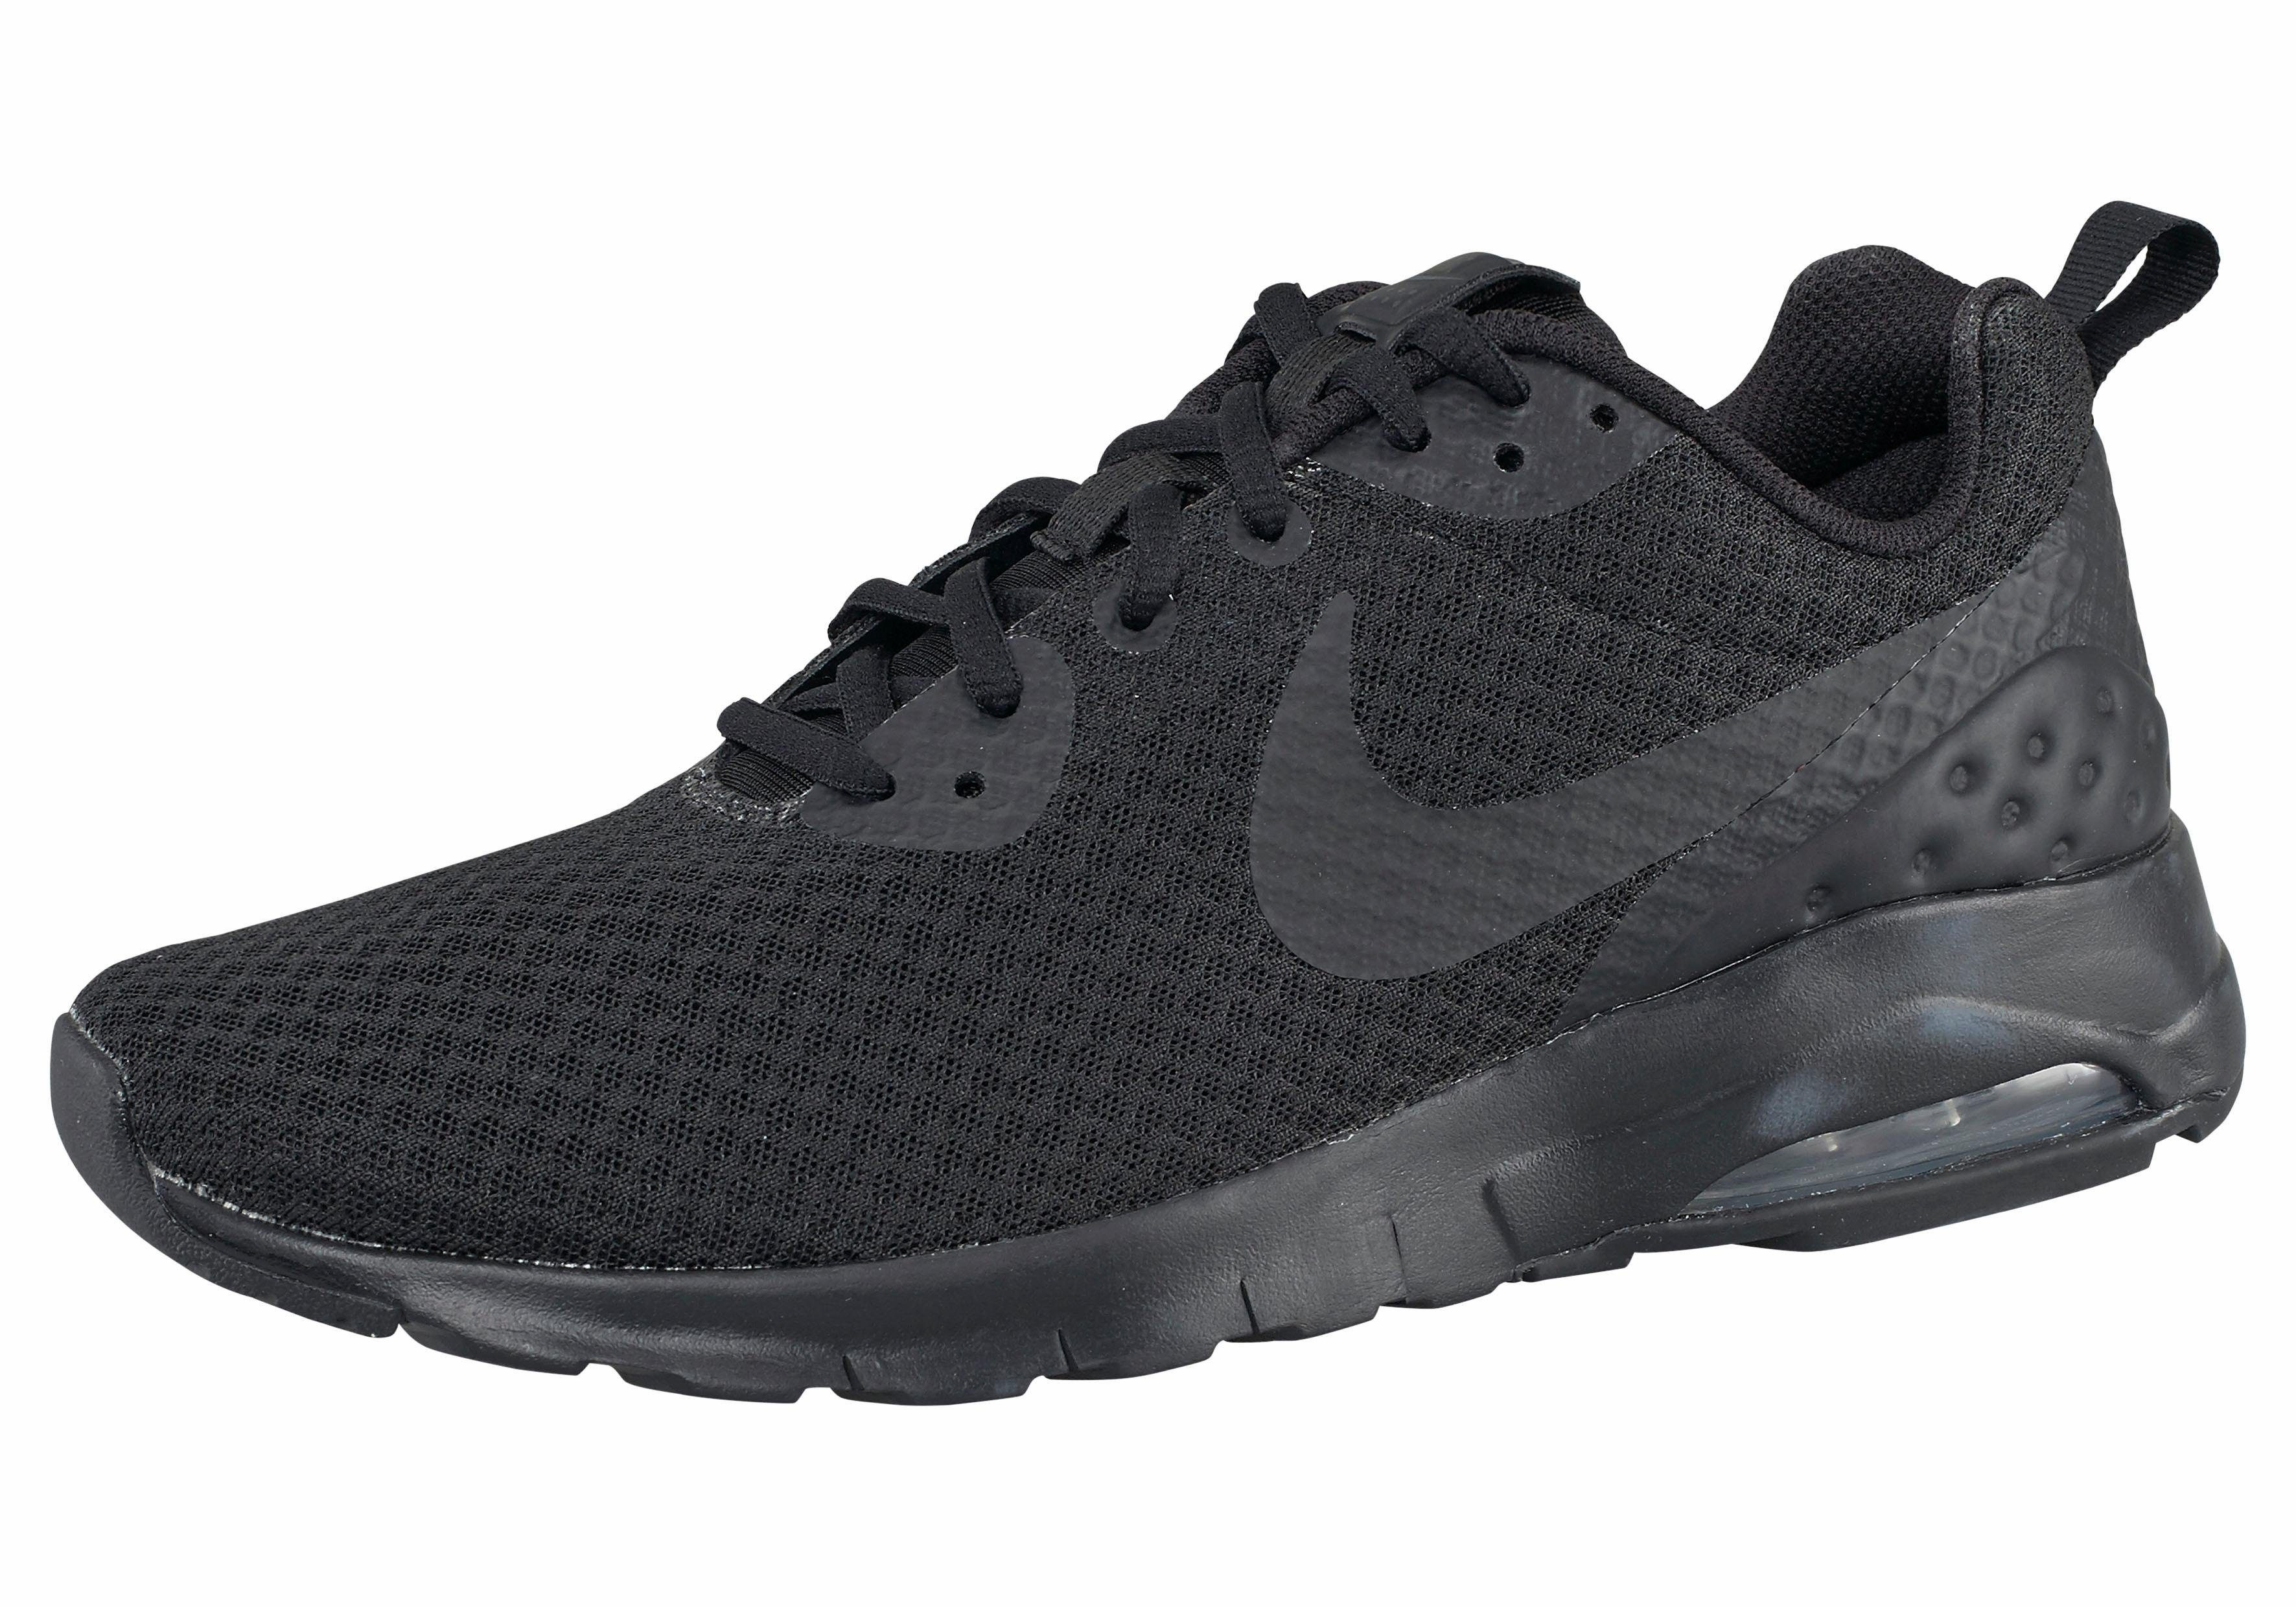 Nike Air Max Motion LW Herren Schuhe Qualität, Nike Schuhe